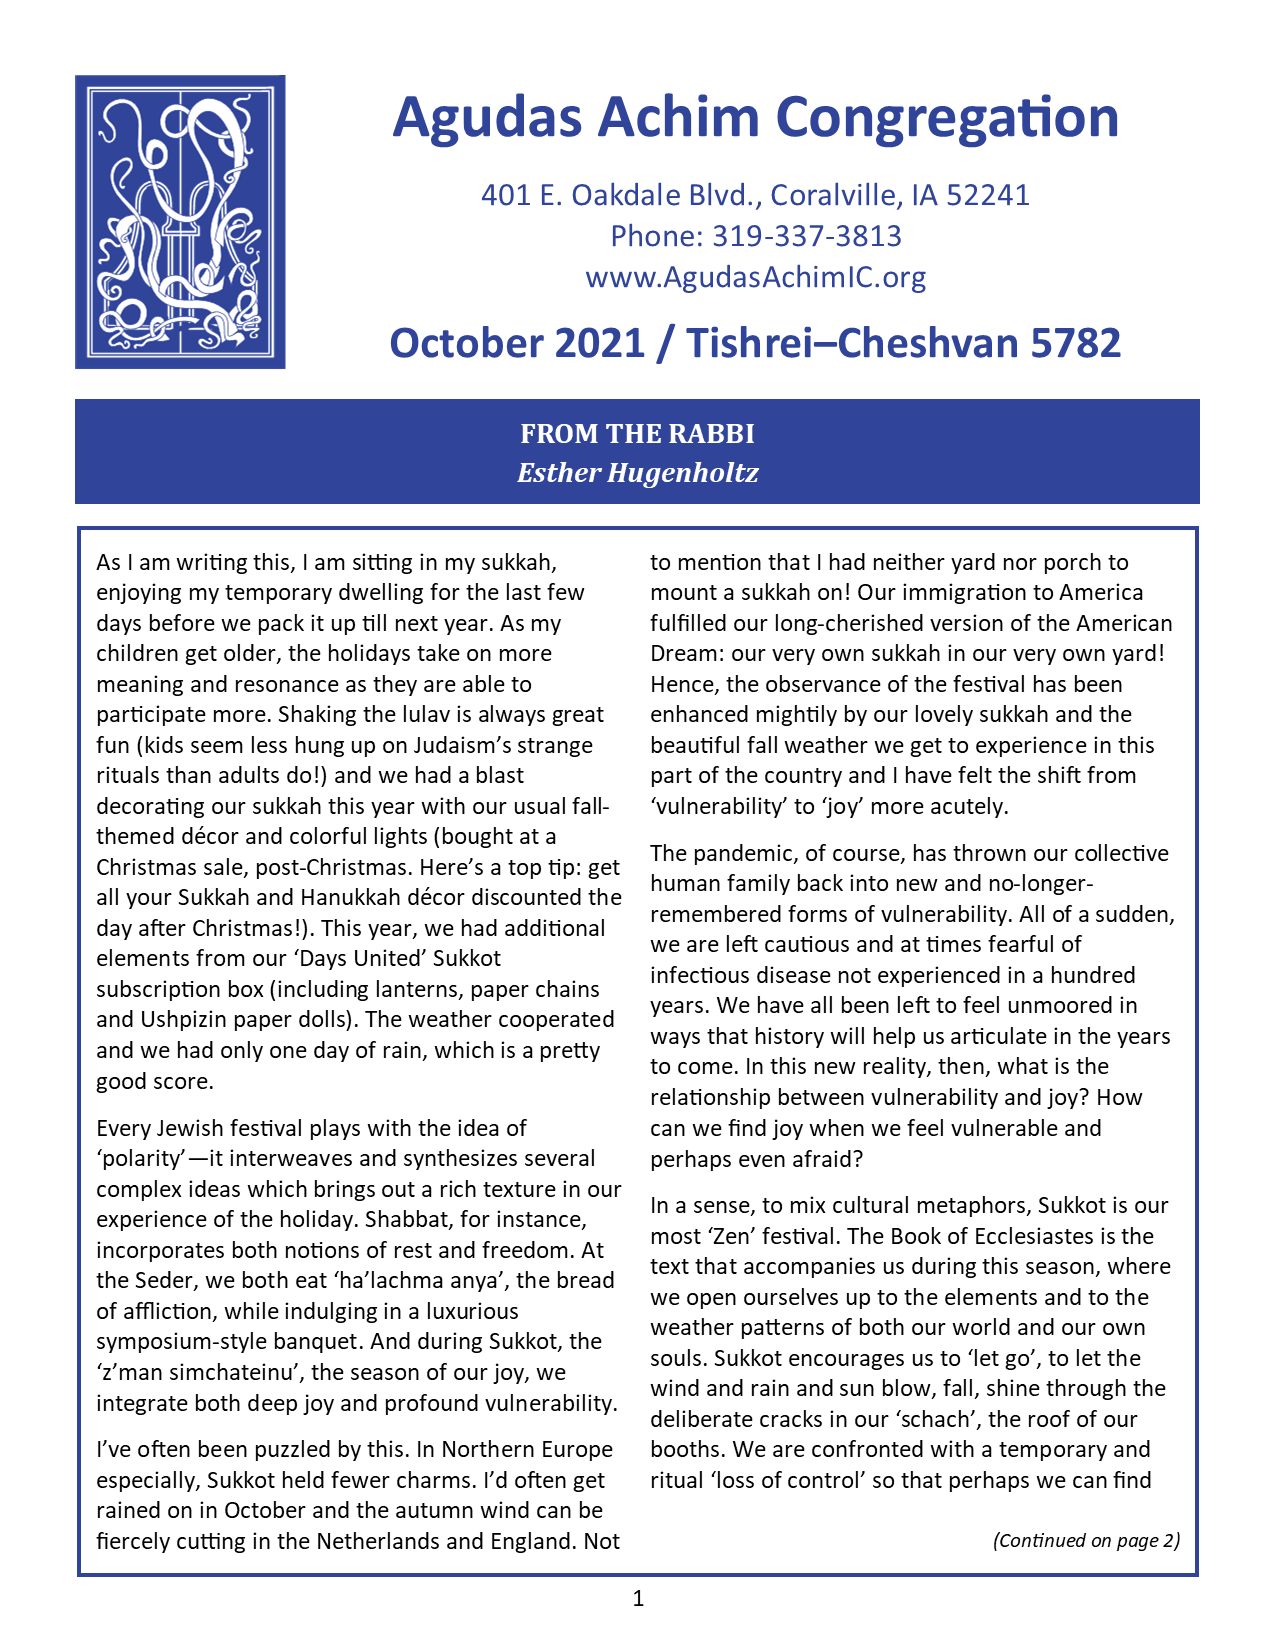 October 2021 Bulletin Cover